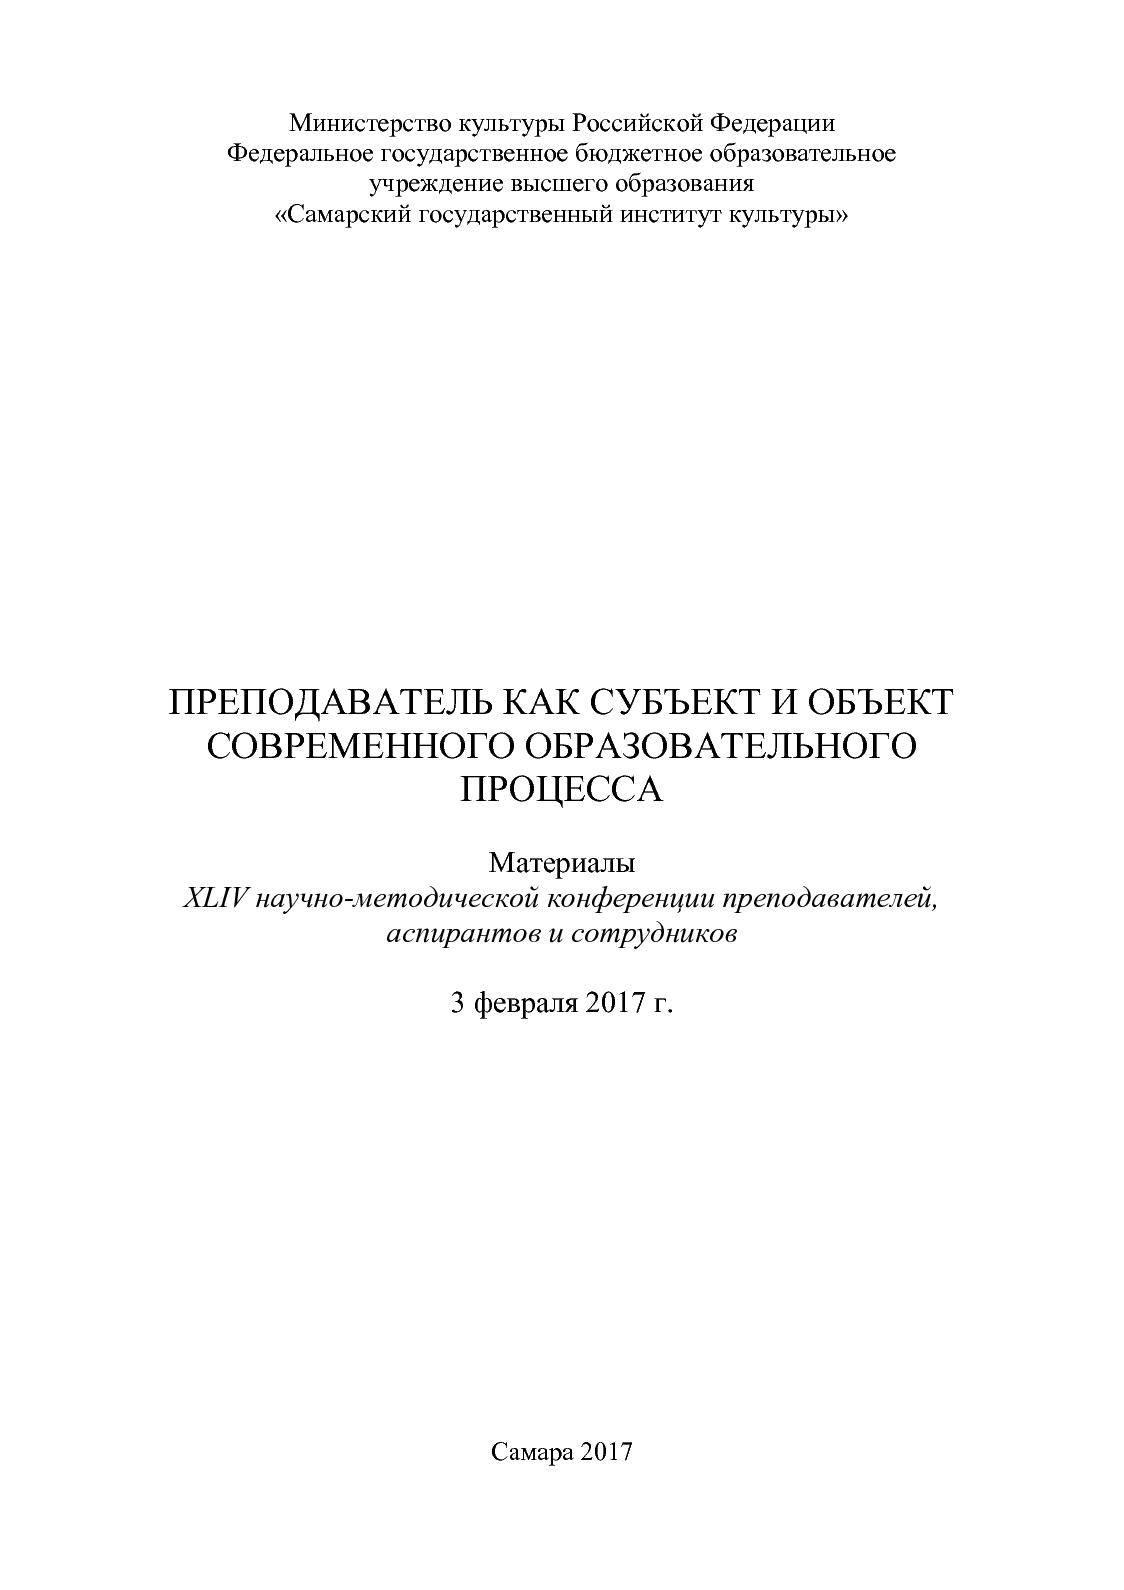 Систематическая десенсибилизация - systematic desensitization - qwe.wiki